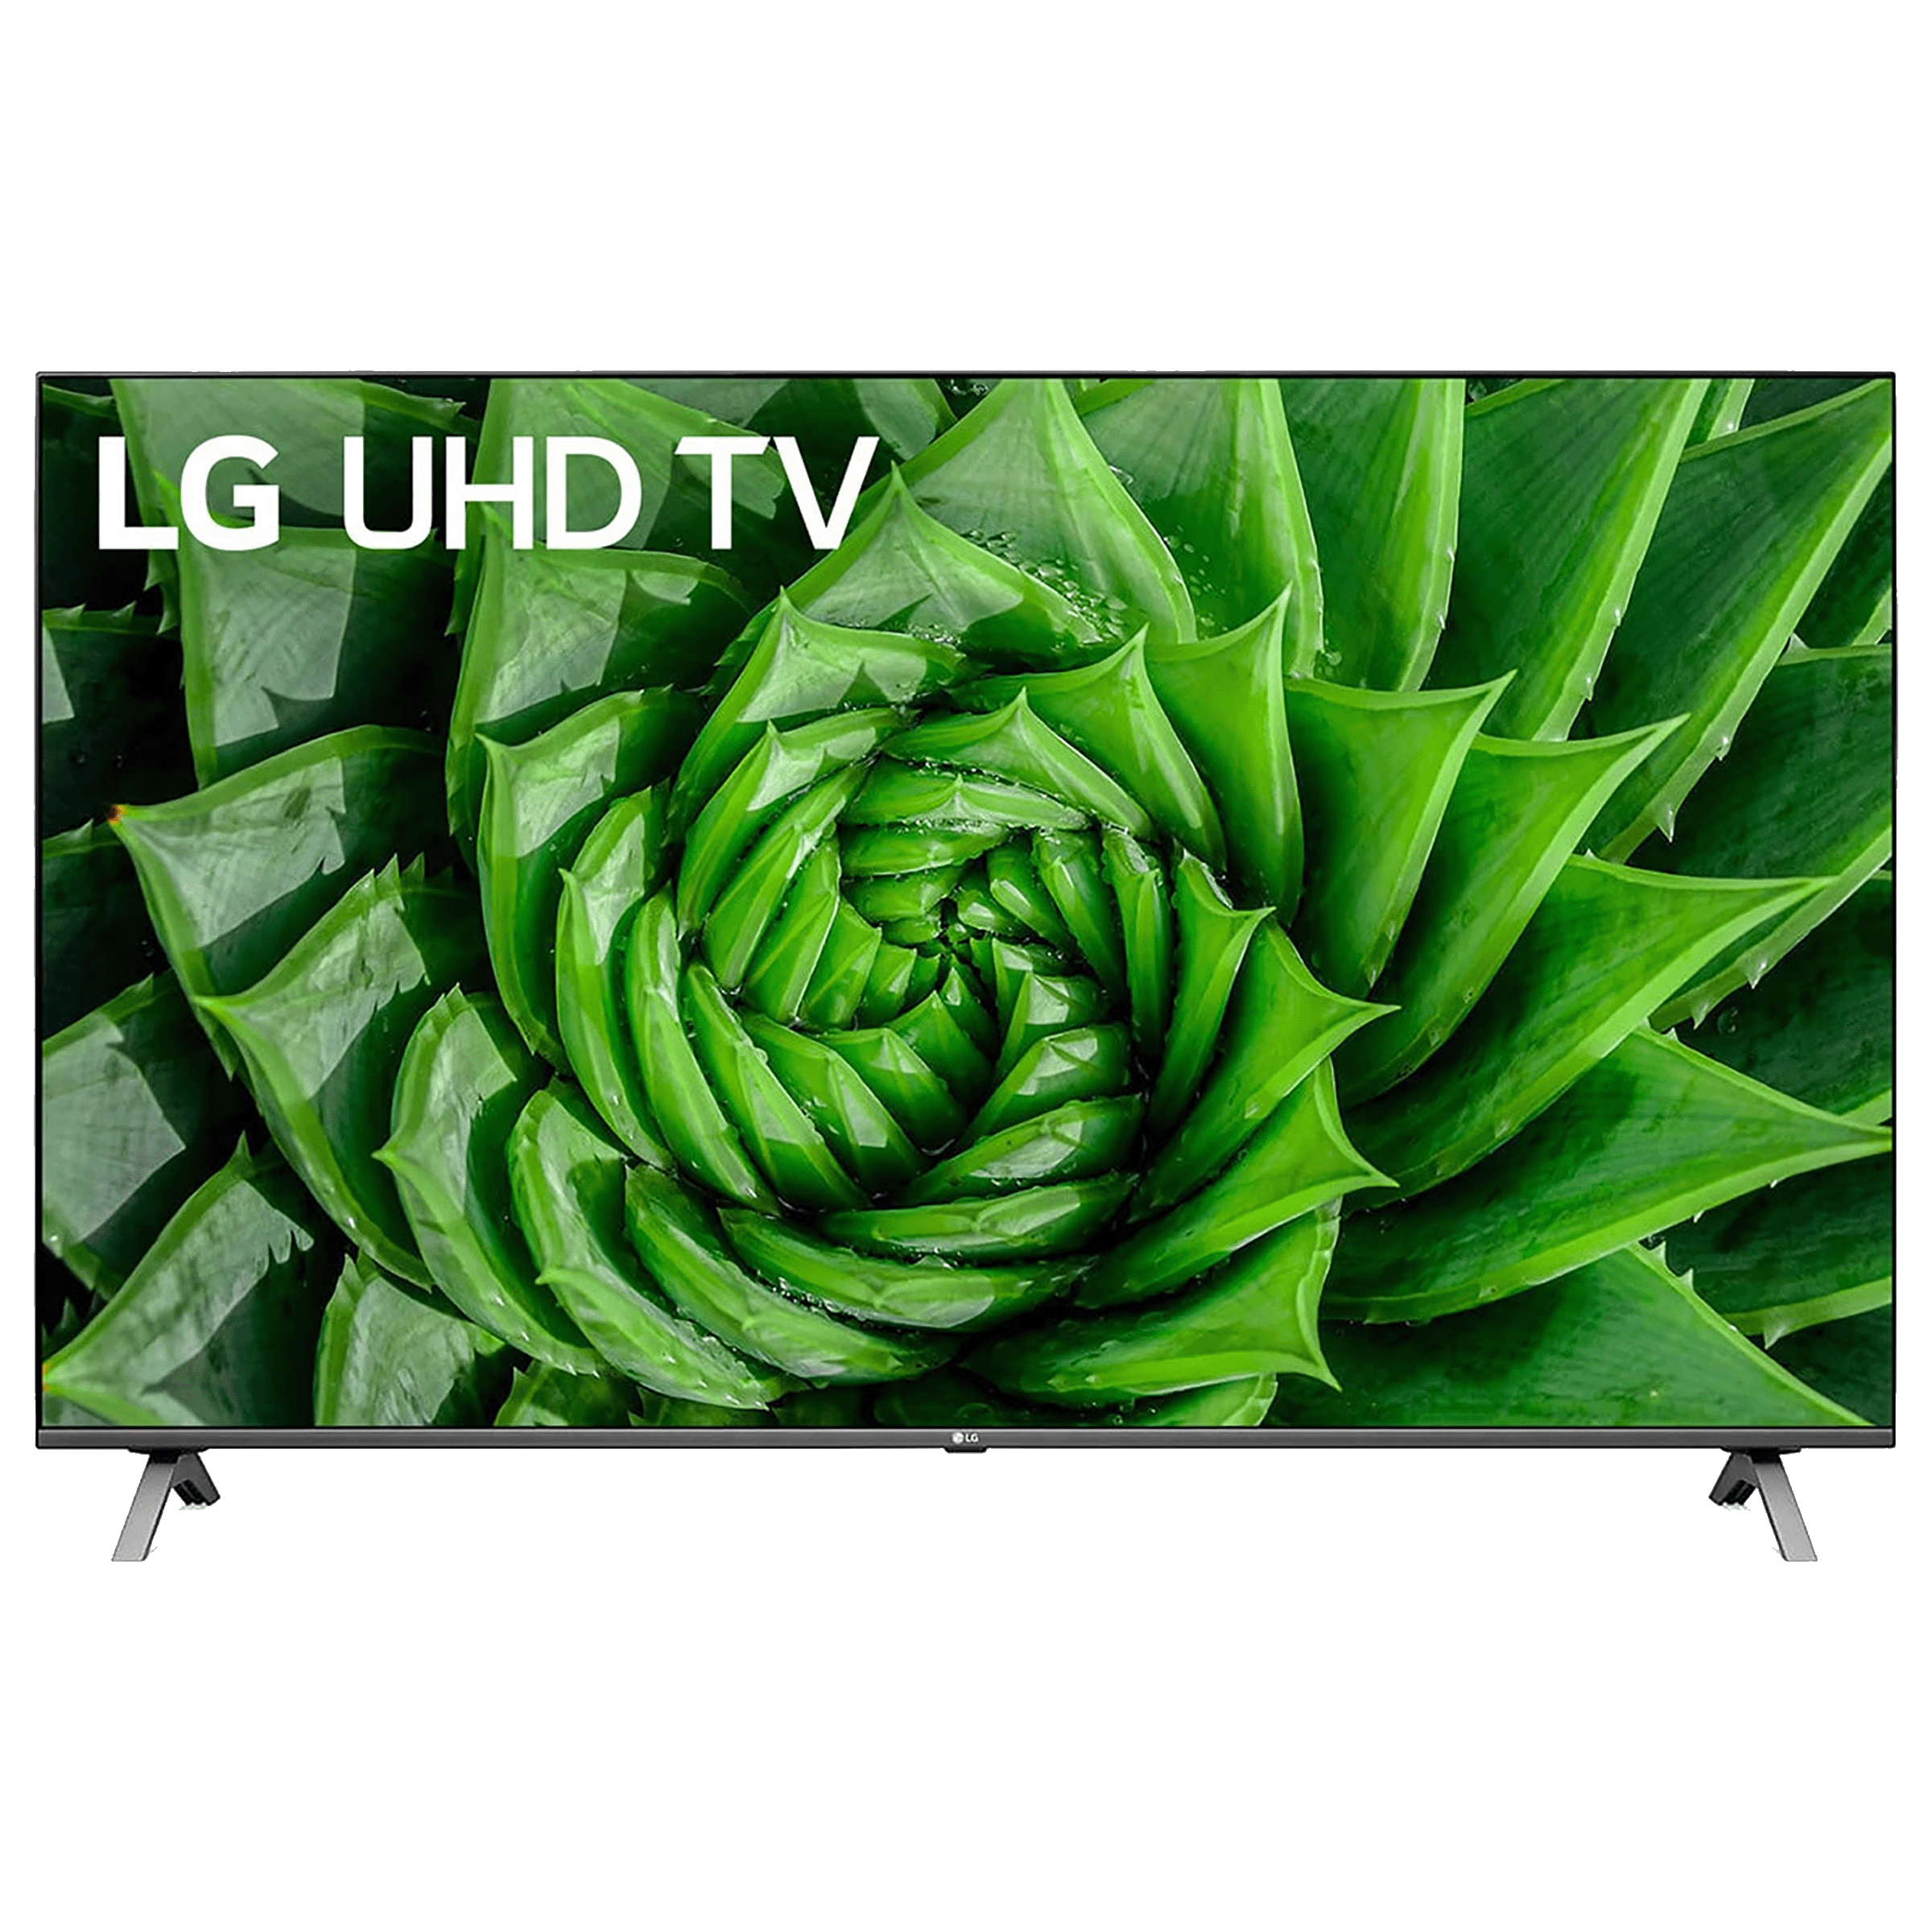 LG UN80 139.7cm (55 Inch) 4K Ultra HD LED OEM Smart TV (55UN8000PTA, Black)_1